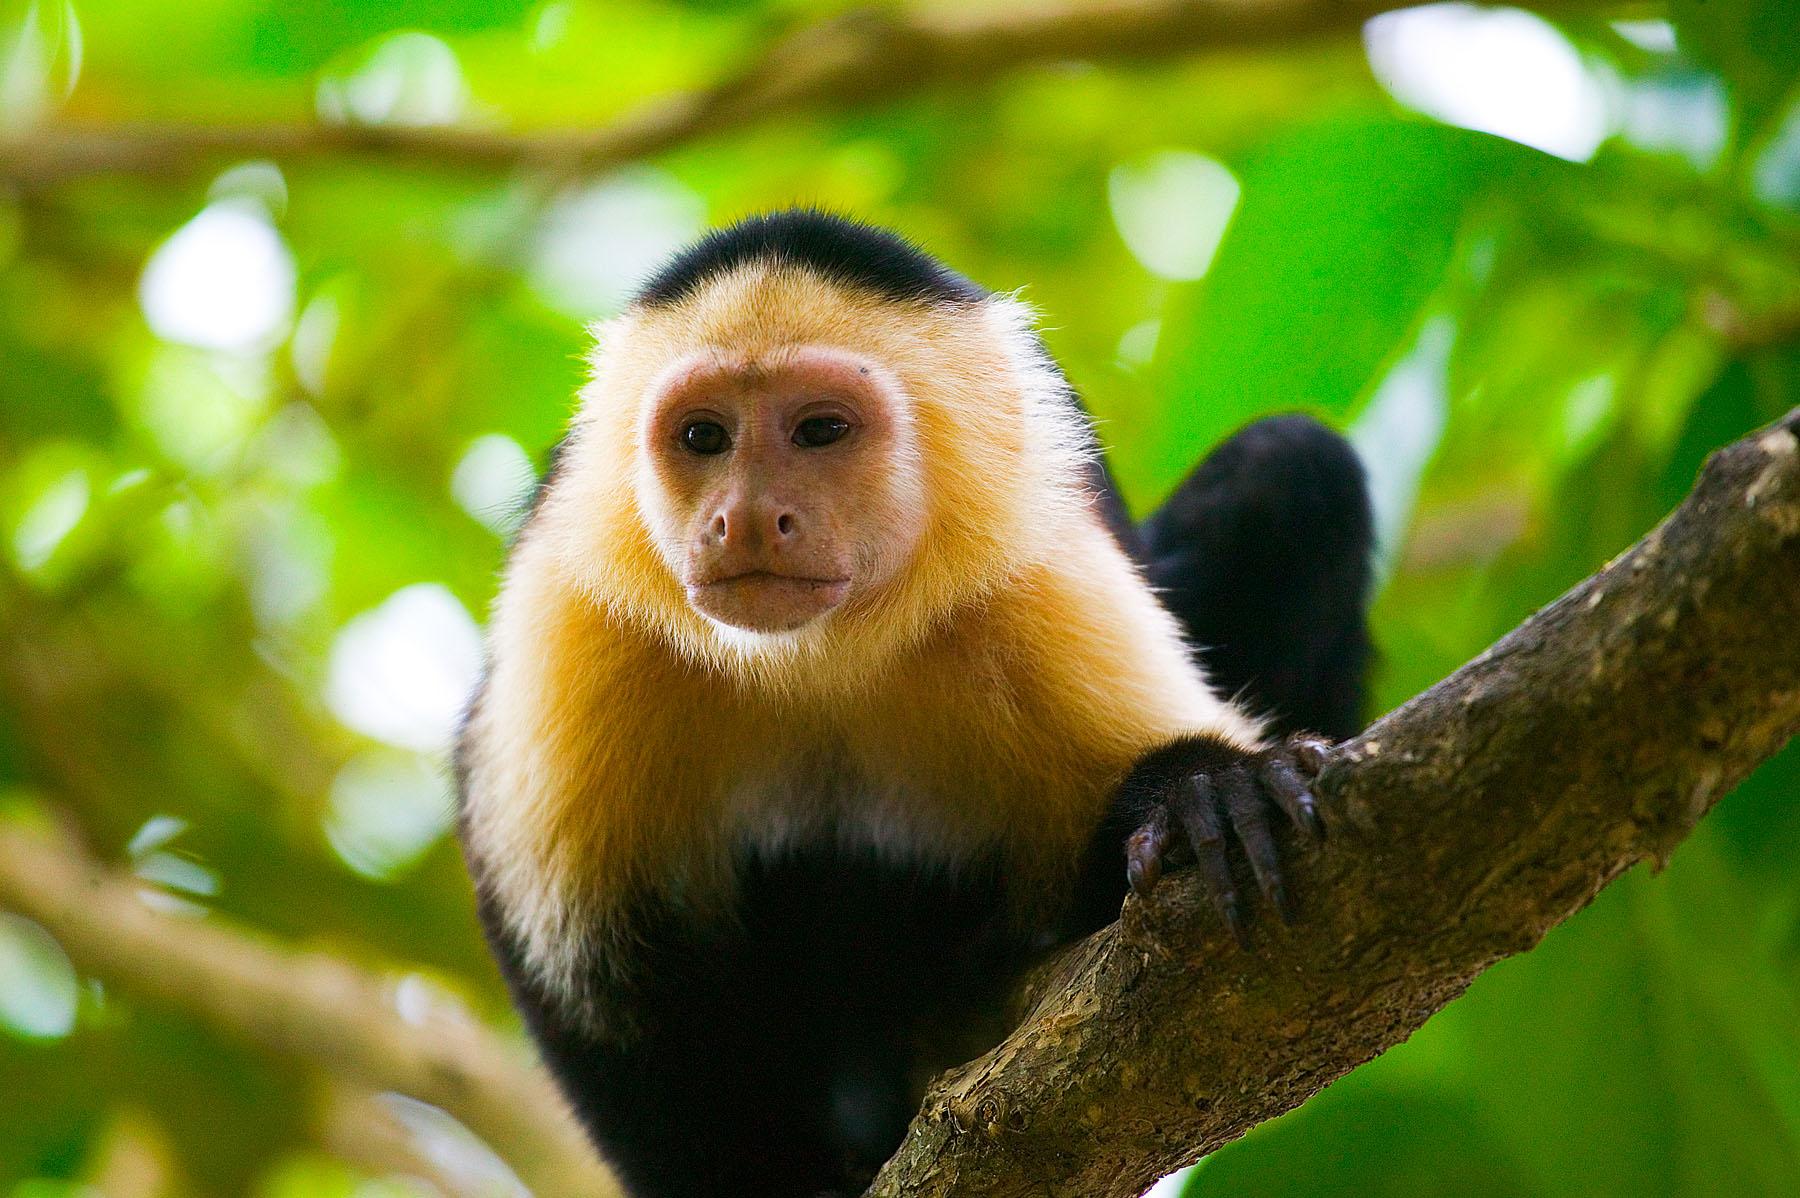 White Faced Capuchin, Costa Rica